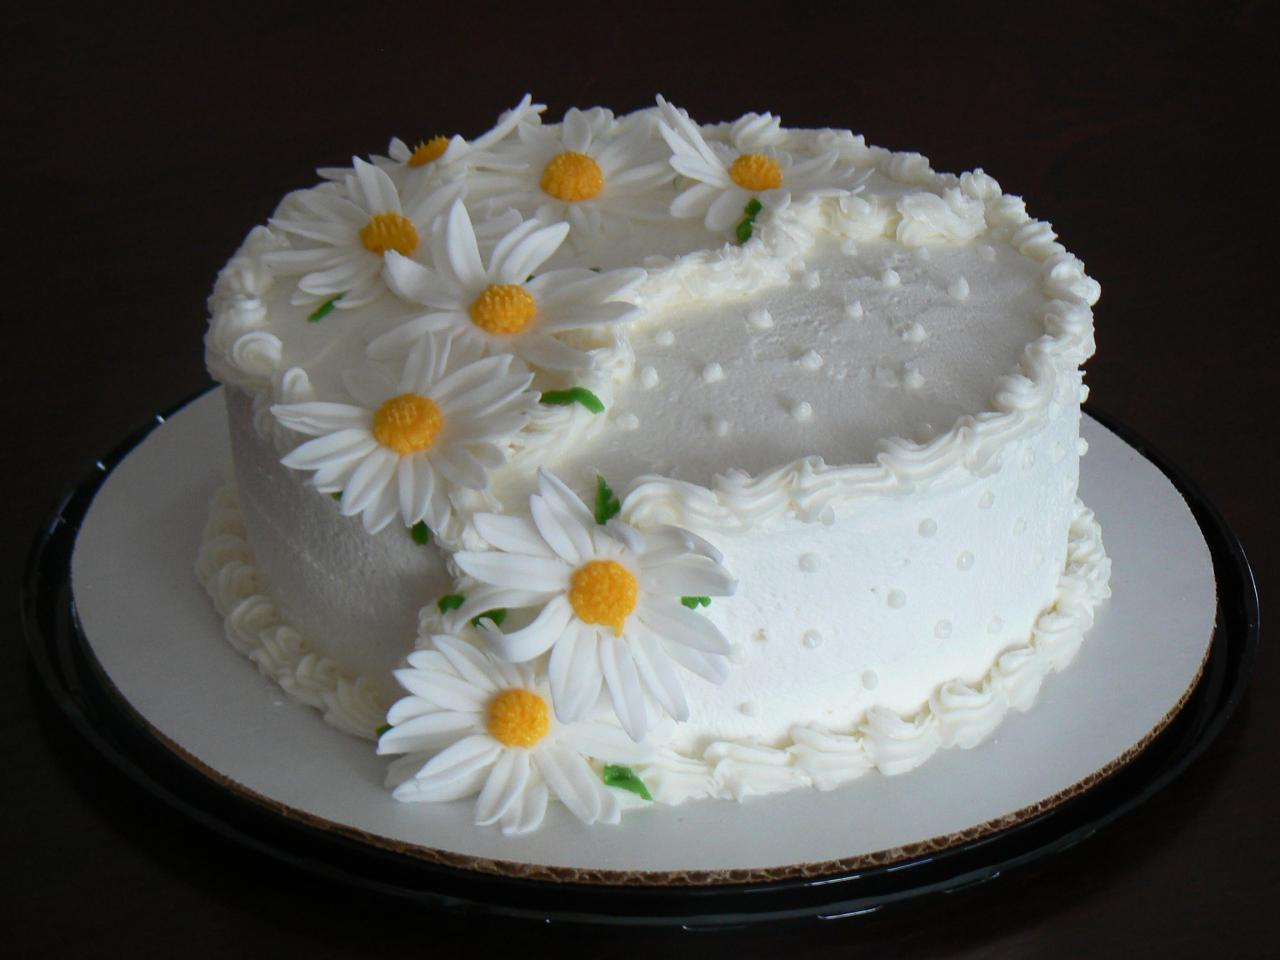 Flower Cakes - Decoration Ideas | Little Birthday Cakes